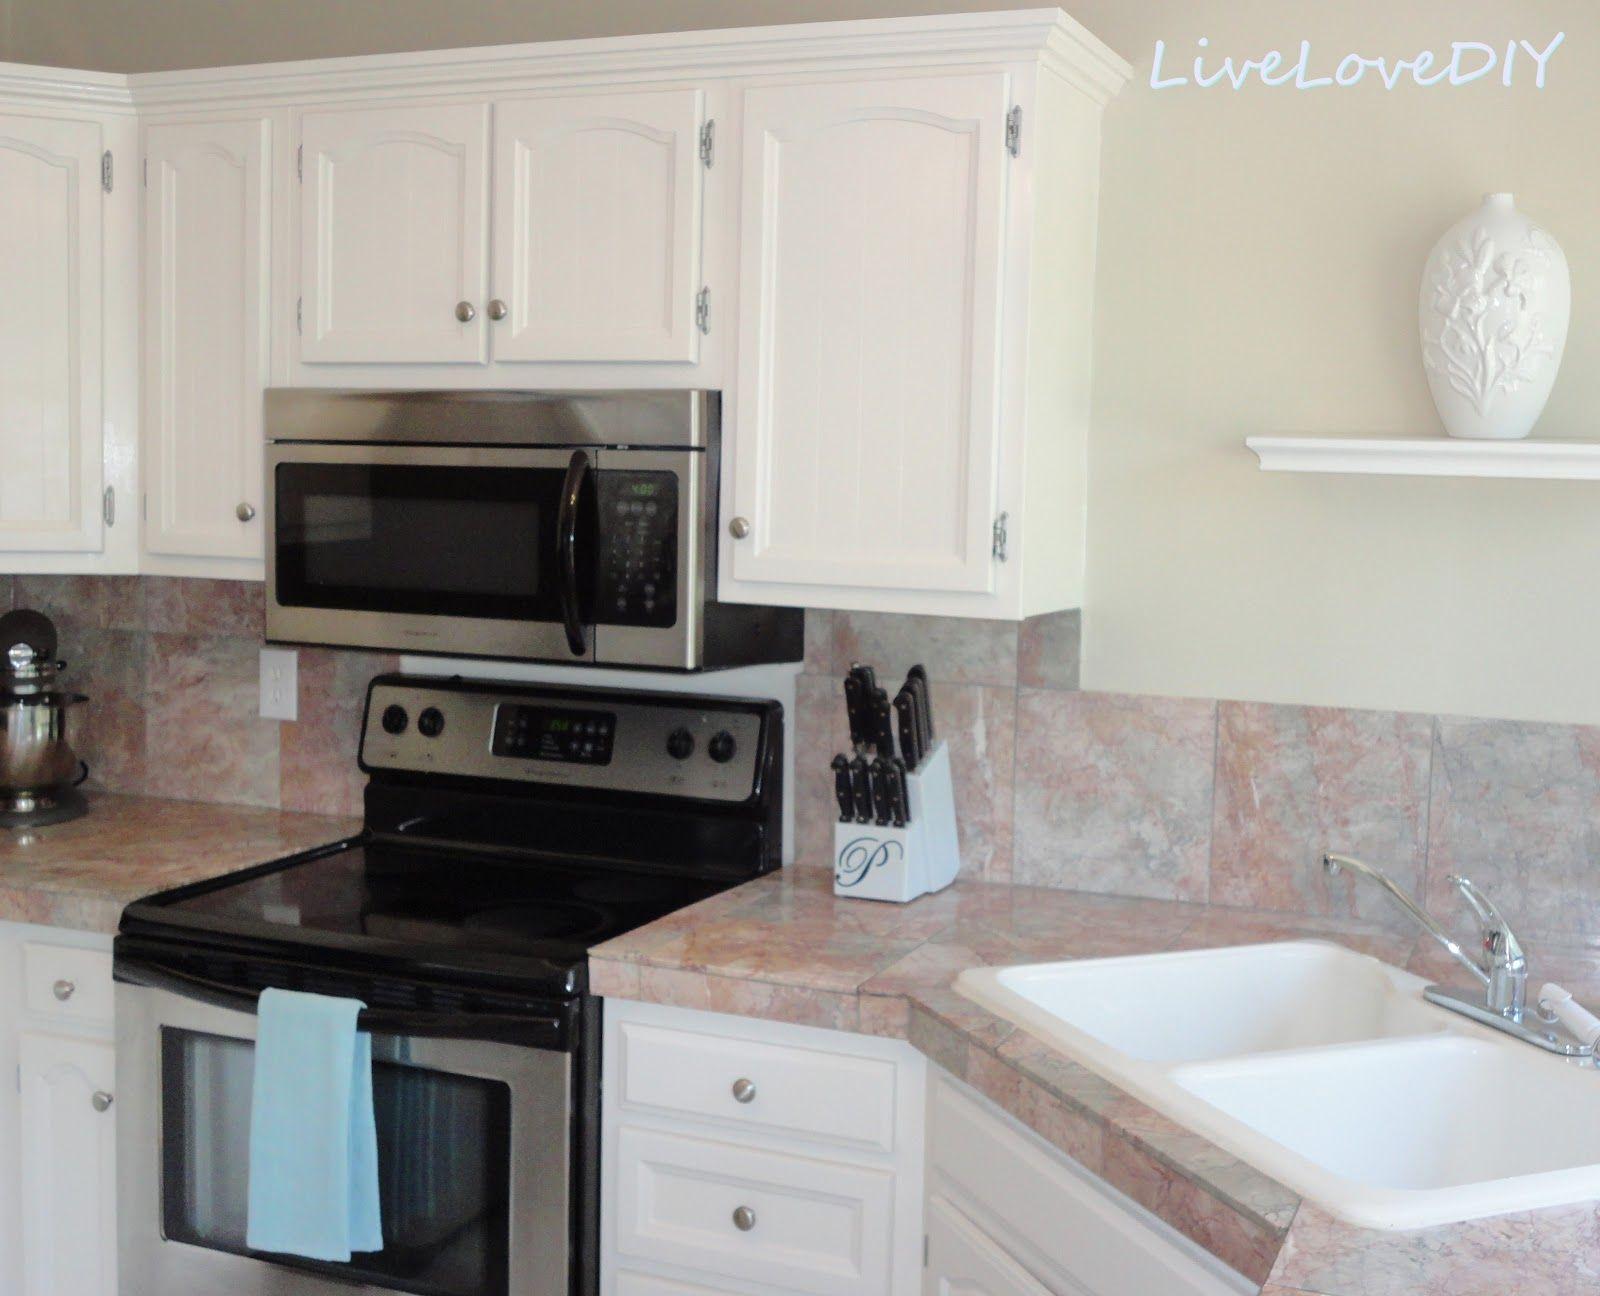 Wonderful Chalk Paint On Kitchen Cabinets Httpwwwbowenhost - Chalk paint kitchen cabinets